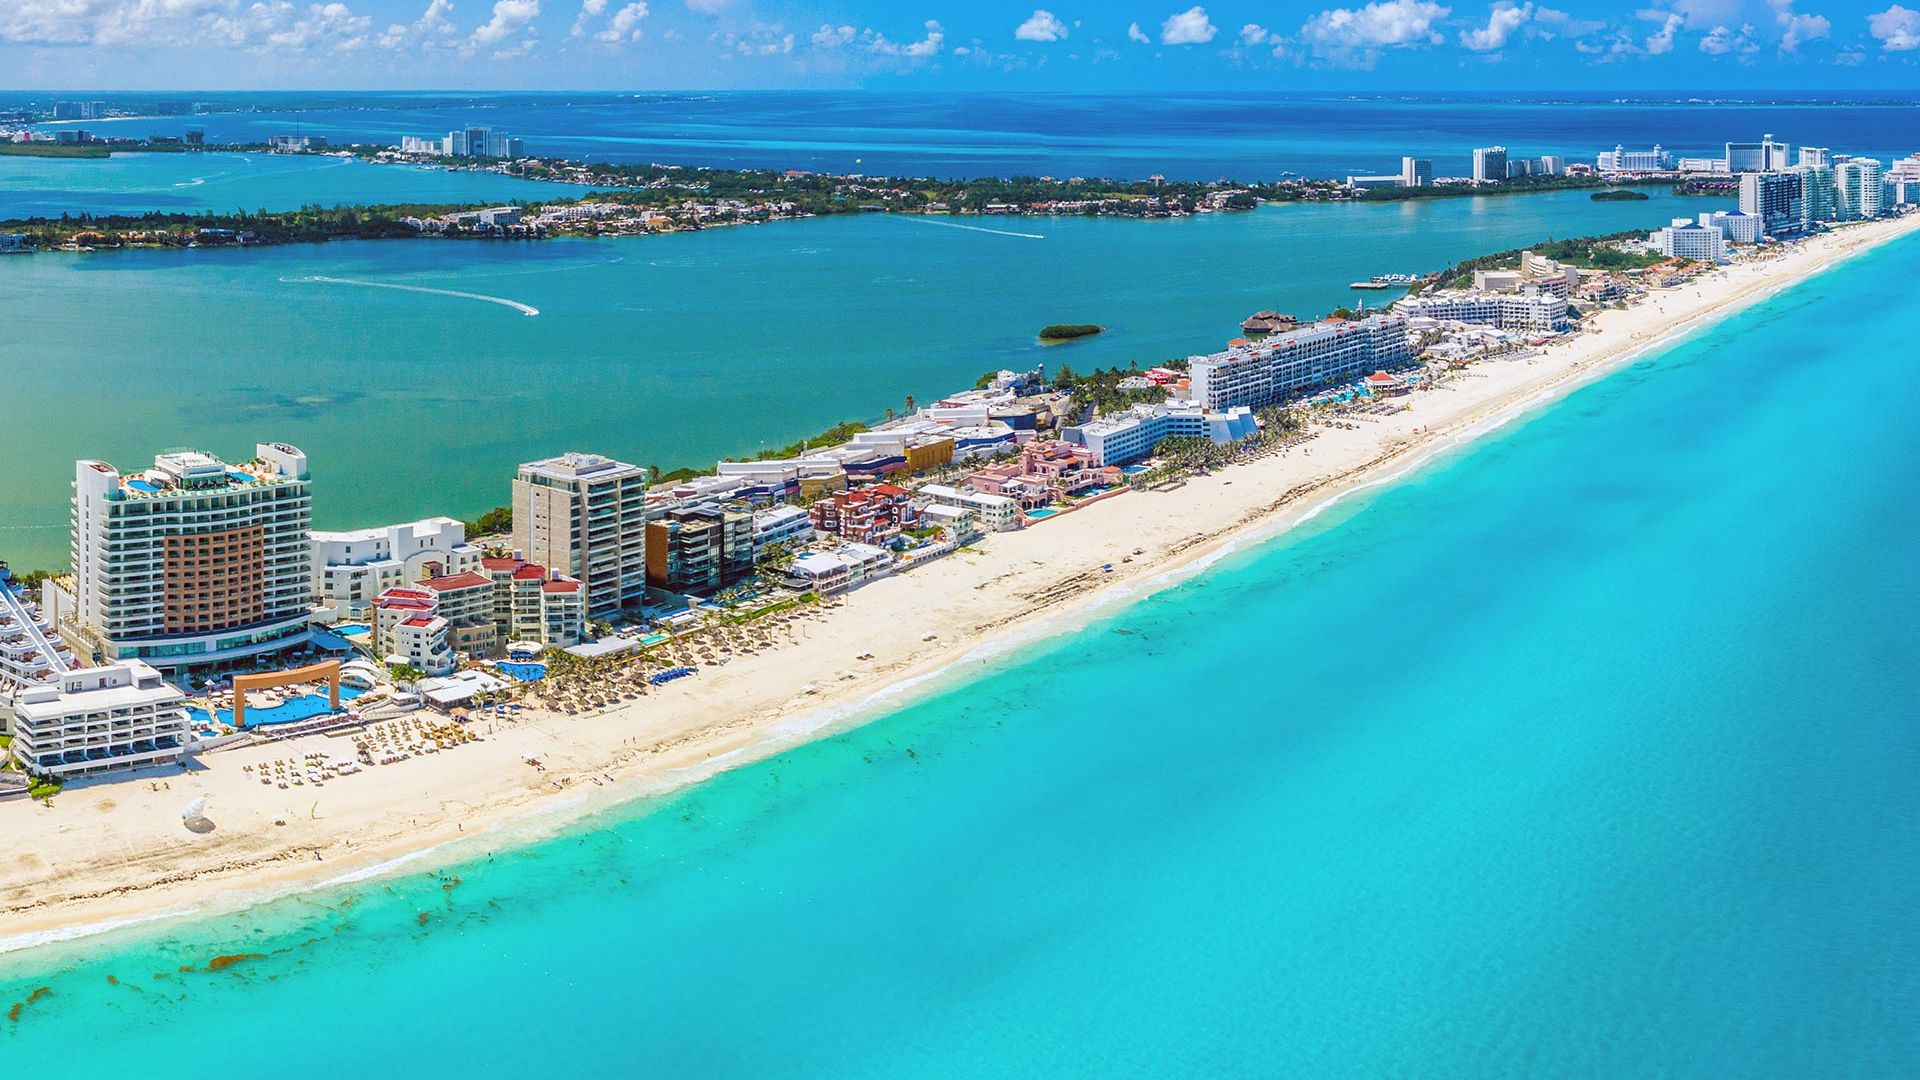 Sejur plaja Cancun si Riviera Maya, Mexic, 11 zile - 26 noiembrie 2021